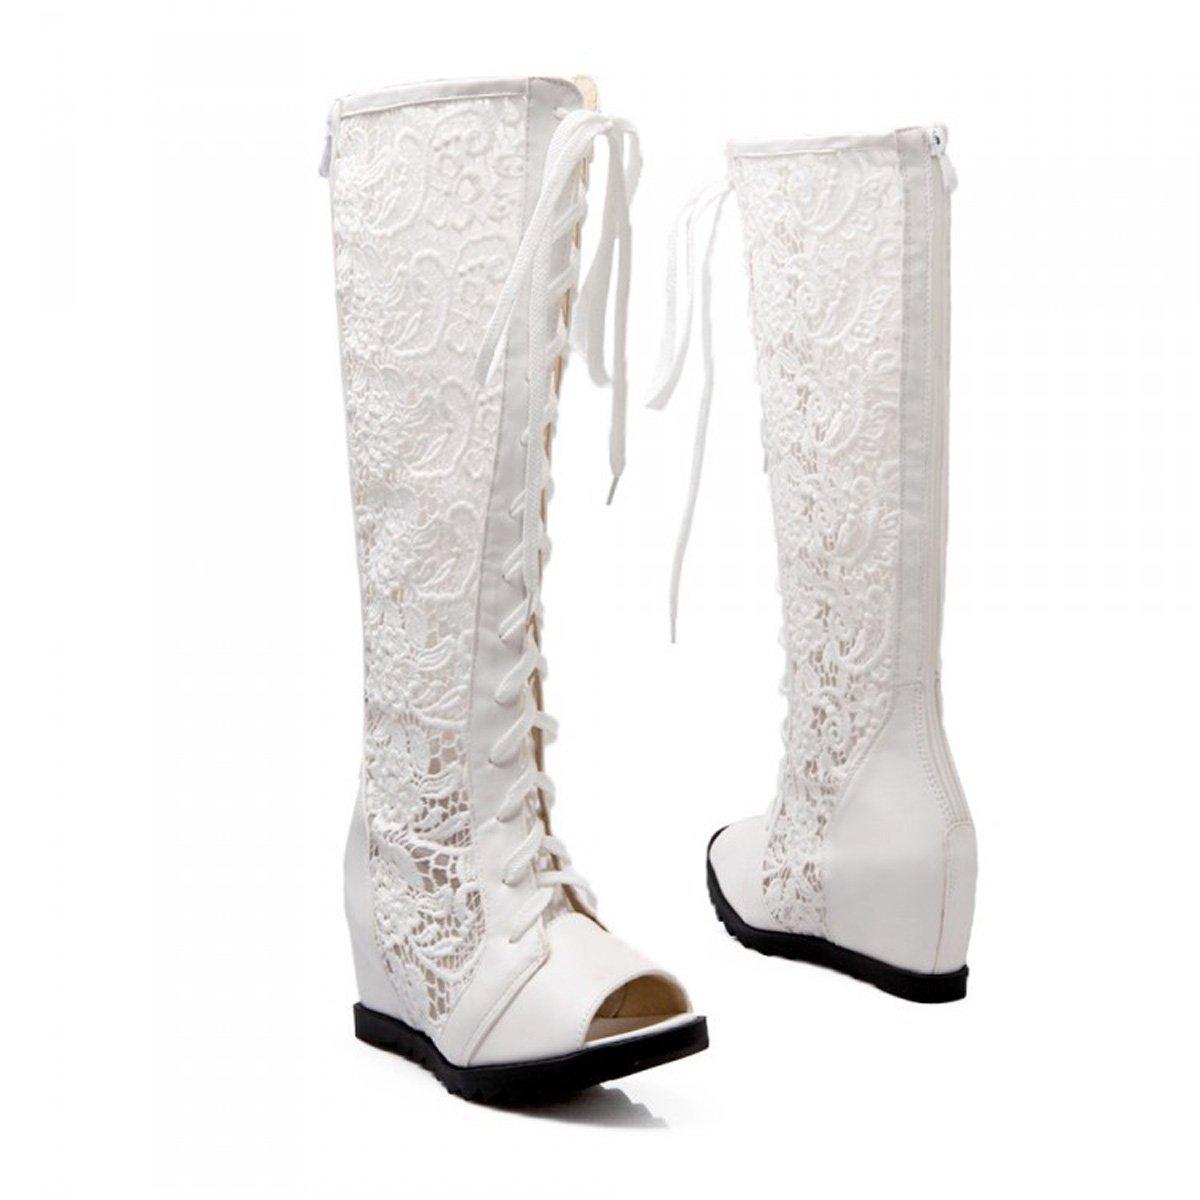 ZXMXY Damen Schuhe Frühling Sommer Herbst Mesh Sandalen Damen Cross Straps Zipper Hohe Stiefel Sandalen im Freien